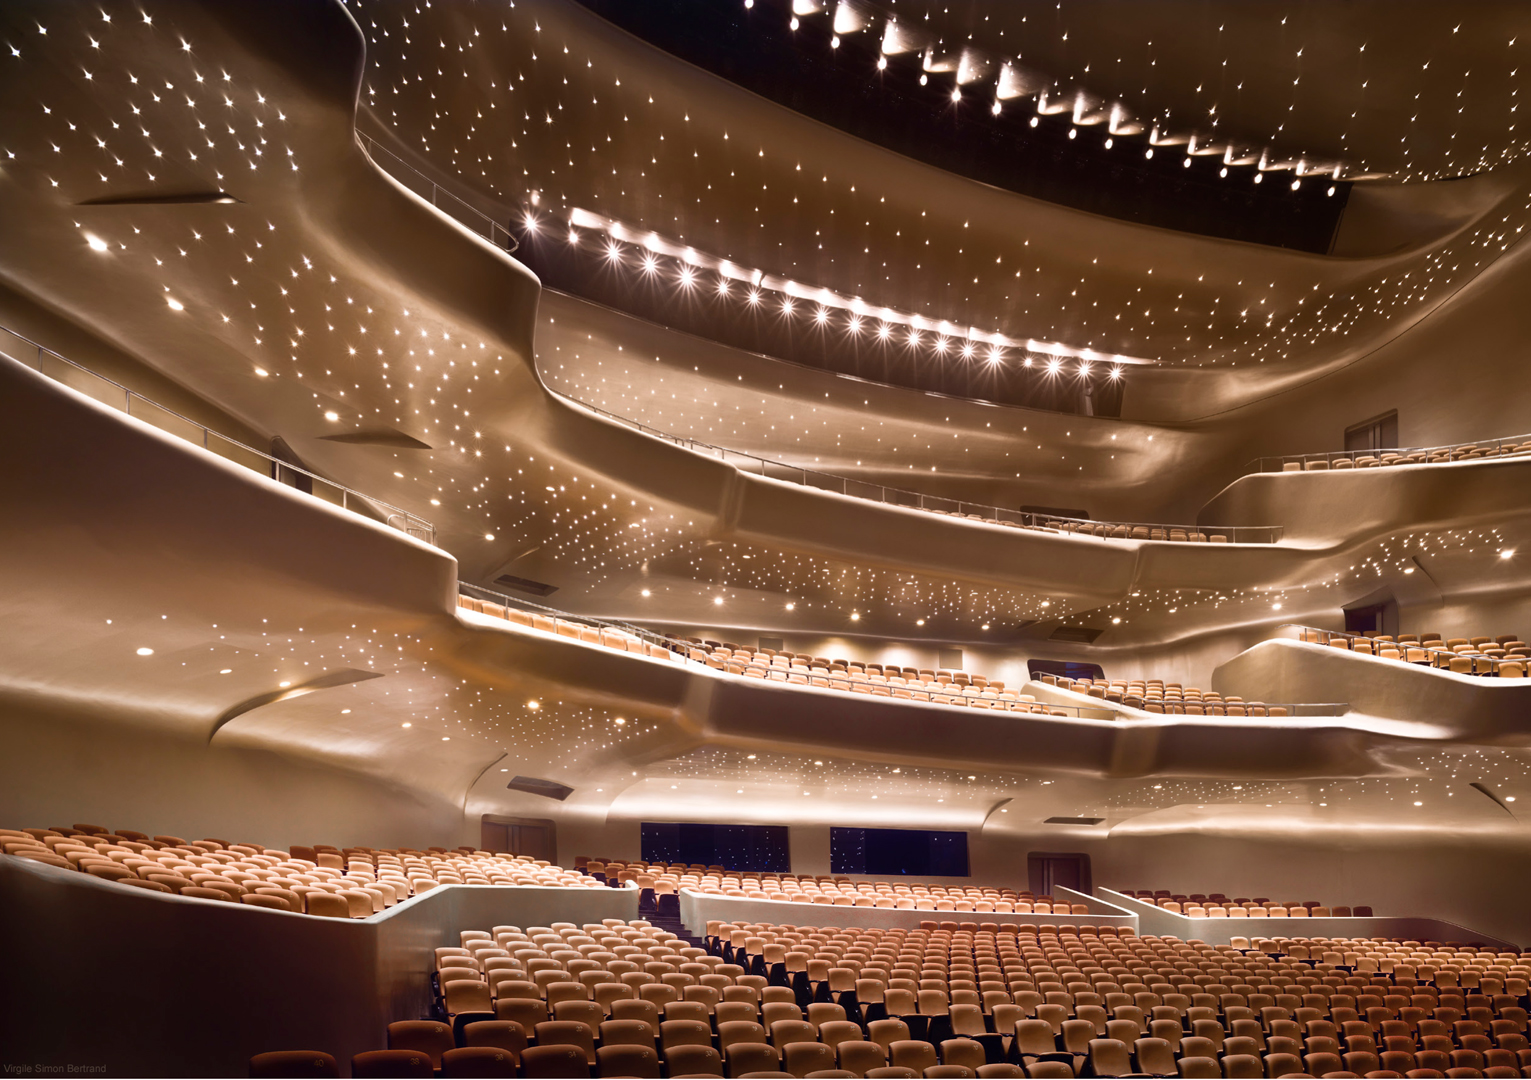 zaha hadid Guangzhou opera 2